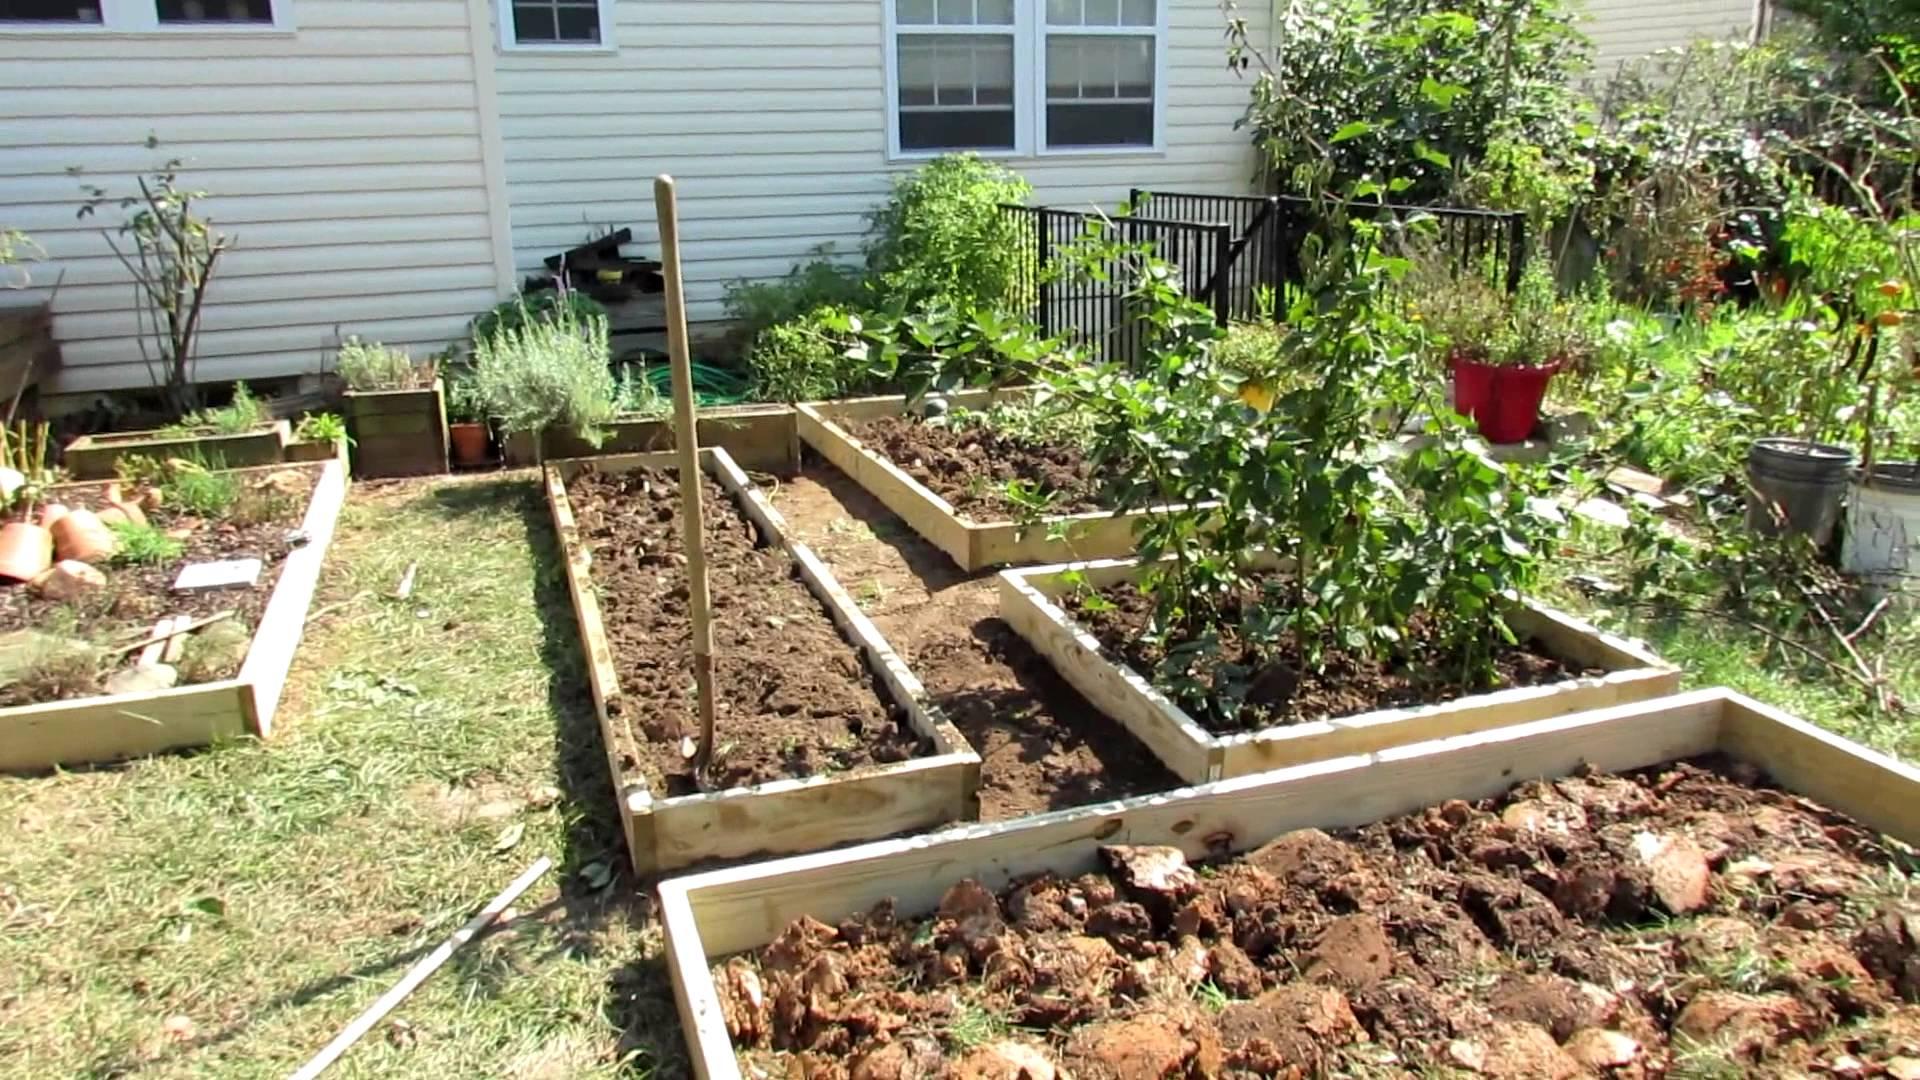 vegetable garden design designing a raised bed vegetable garden: a fall makeover! - youtube DMTHTLZ